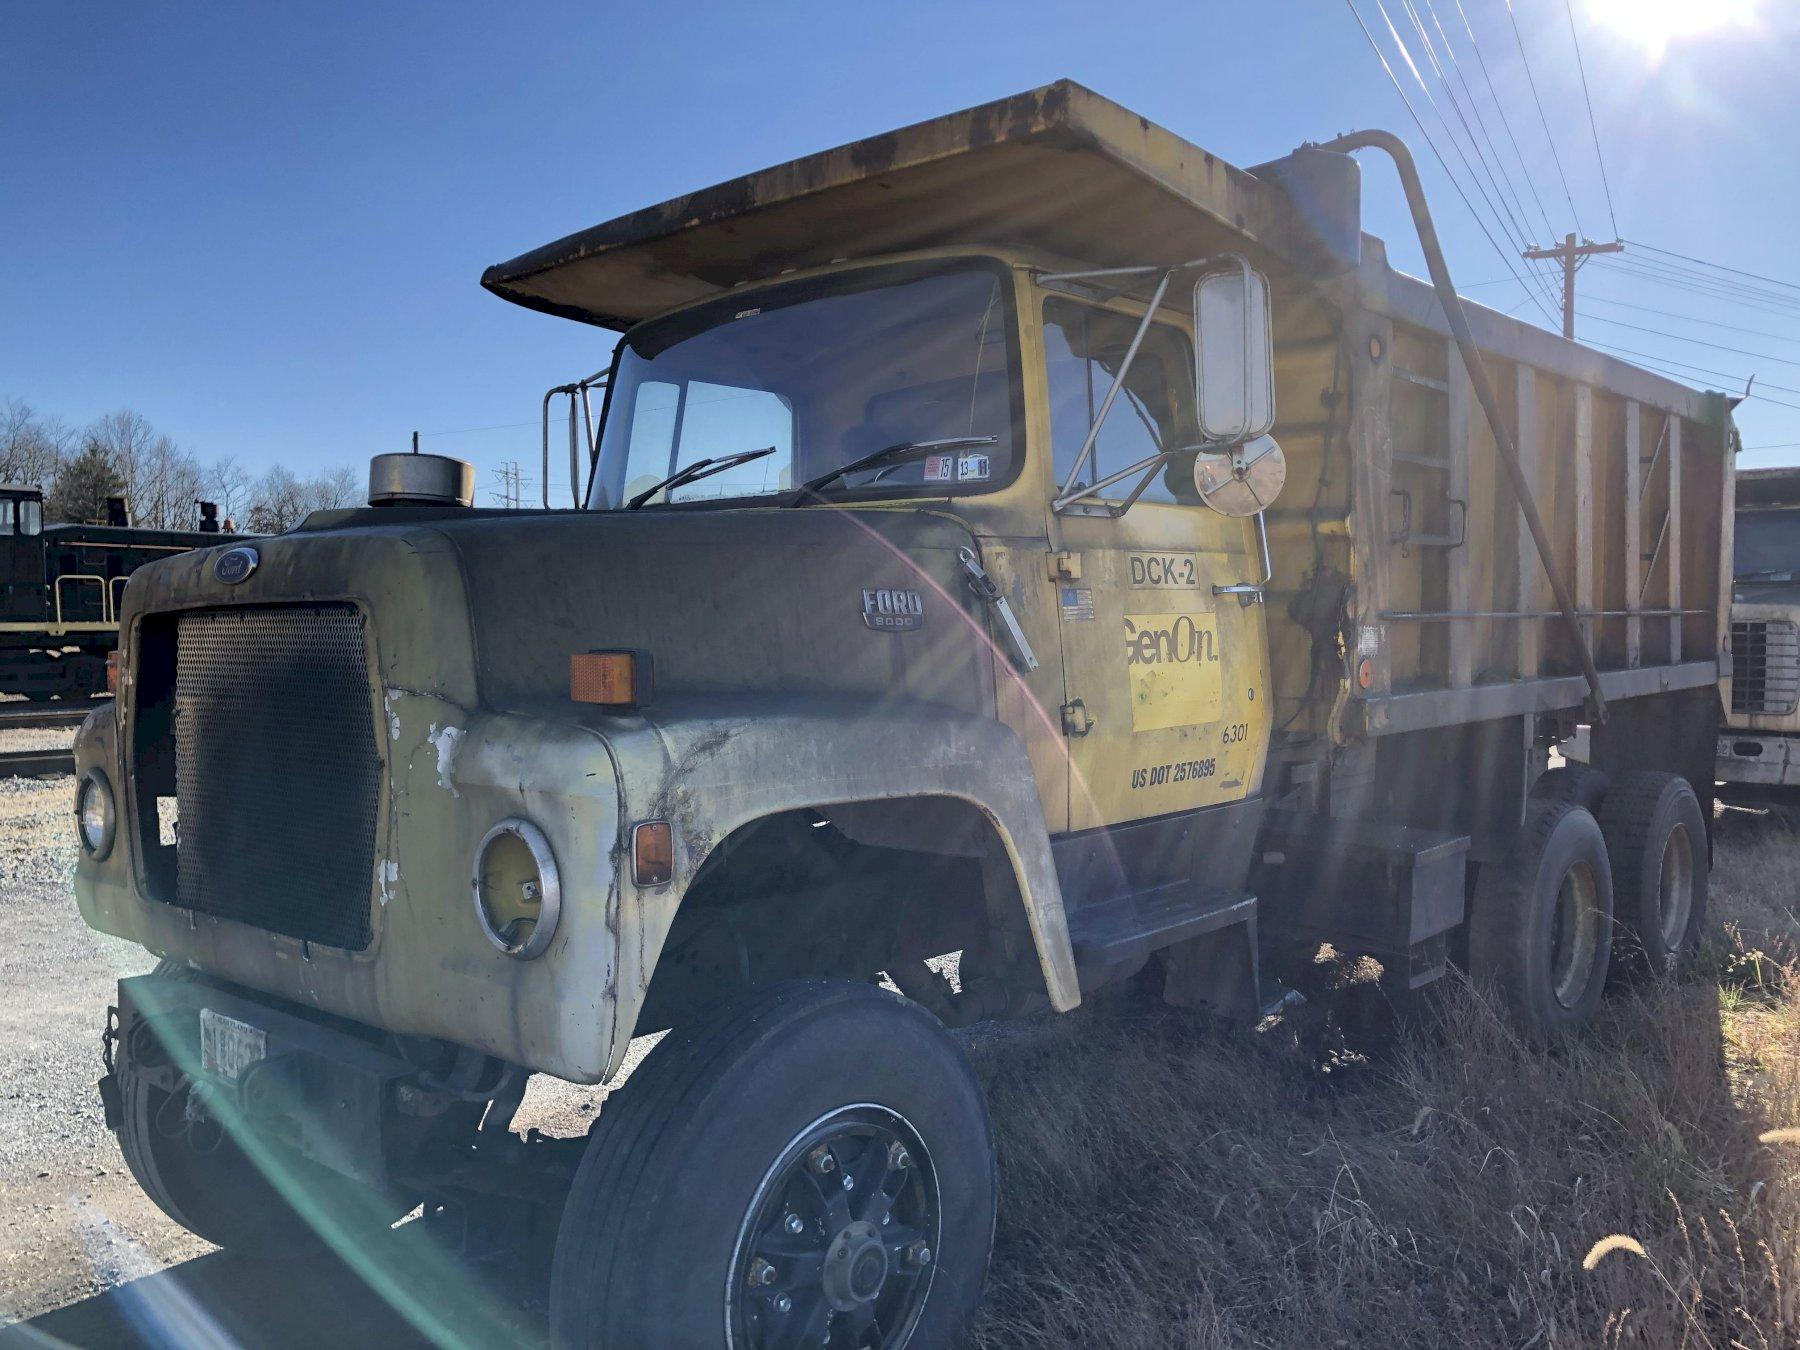 Ford 8000 diesel powered dump truck vin# 1fdyu80u9fva58060 with 15' dump body, 55856 miles